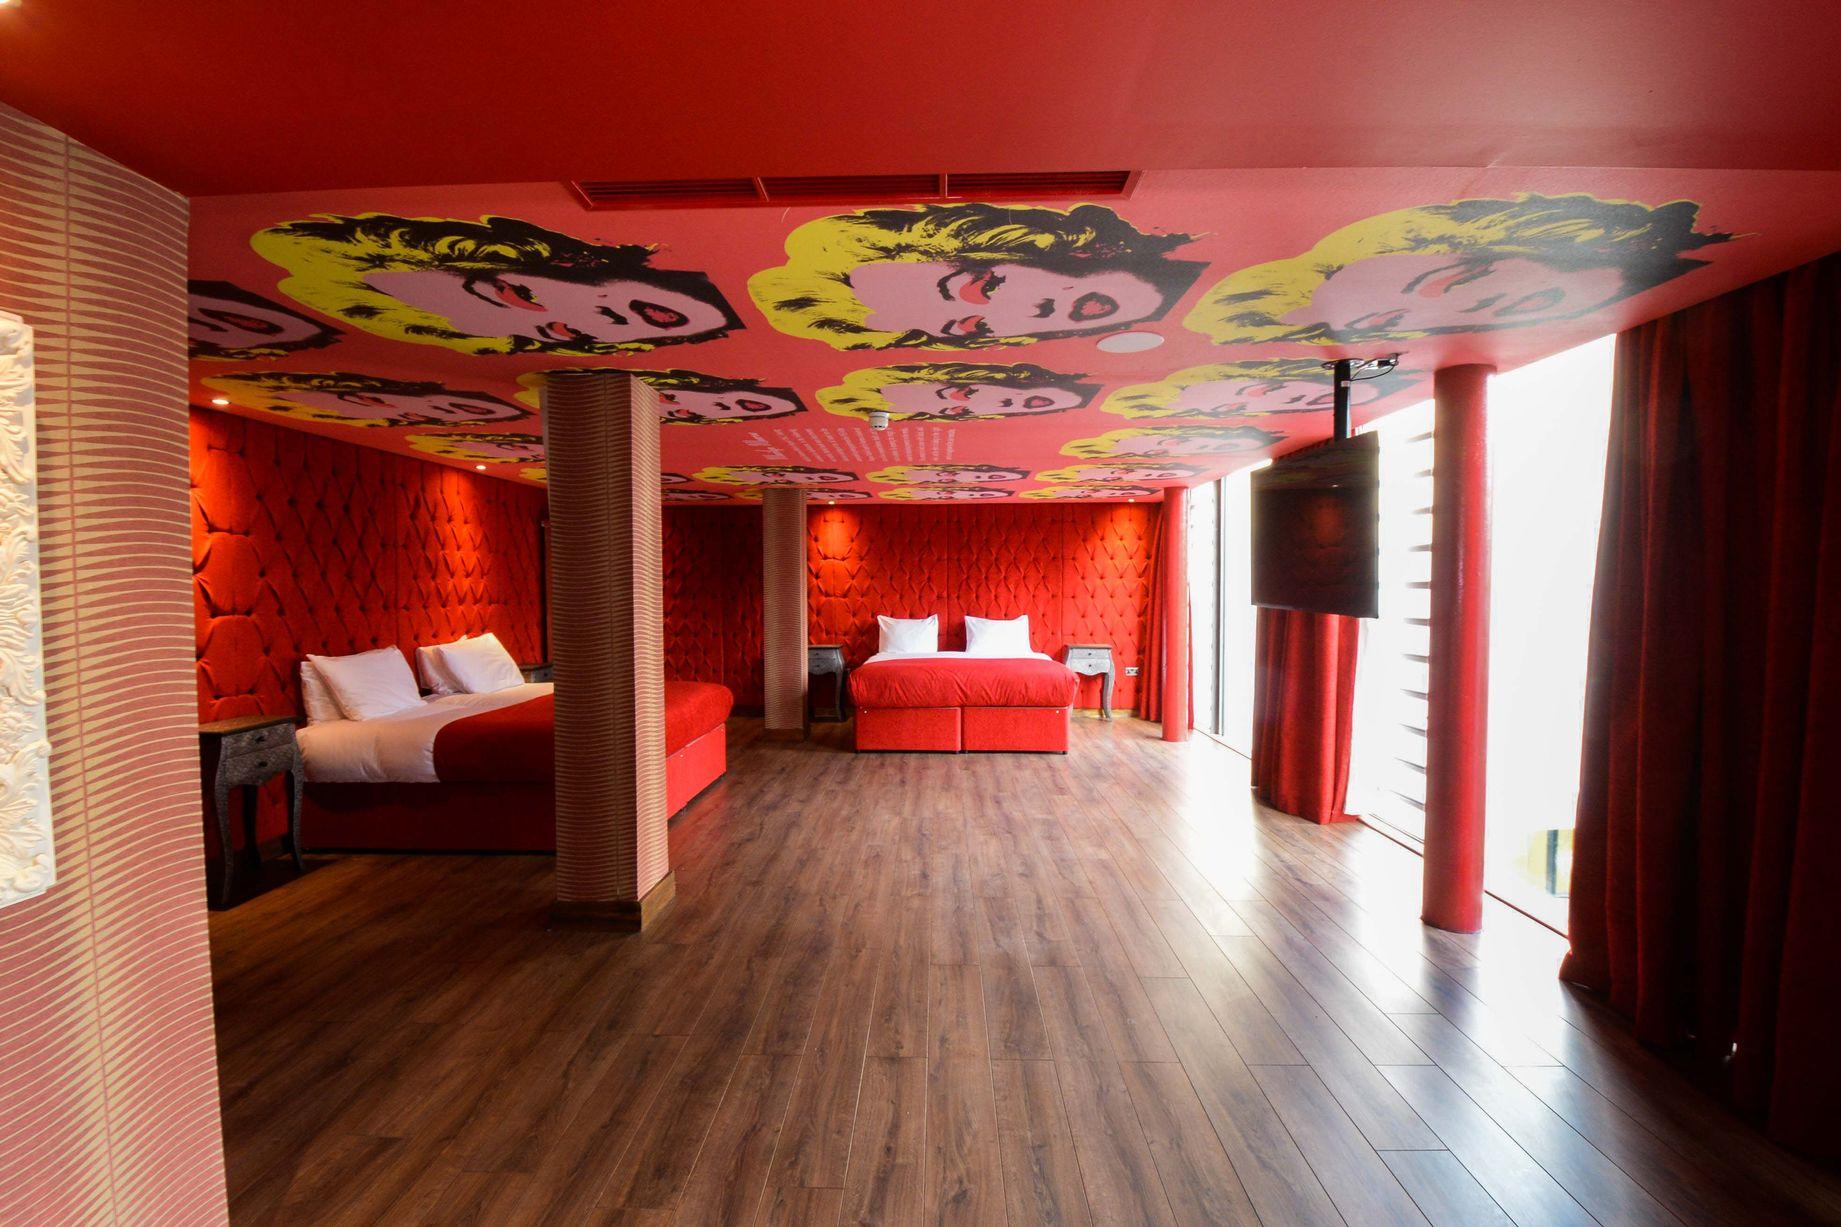 Movie themed hotel in Liverpool | OzSeeker